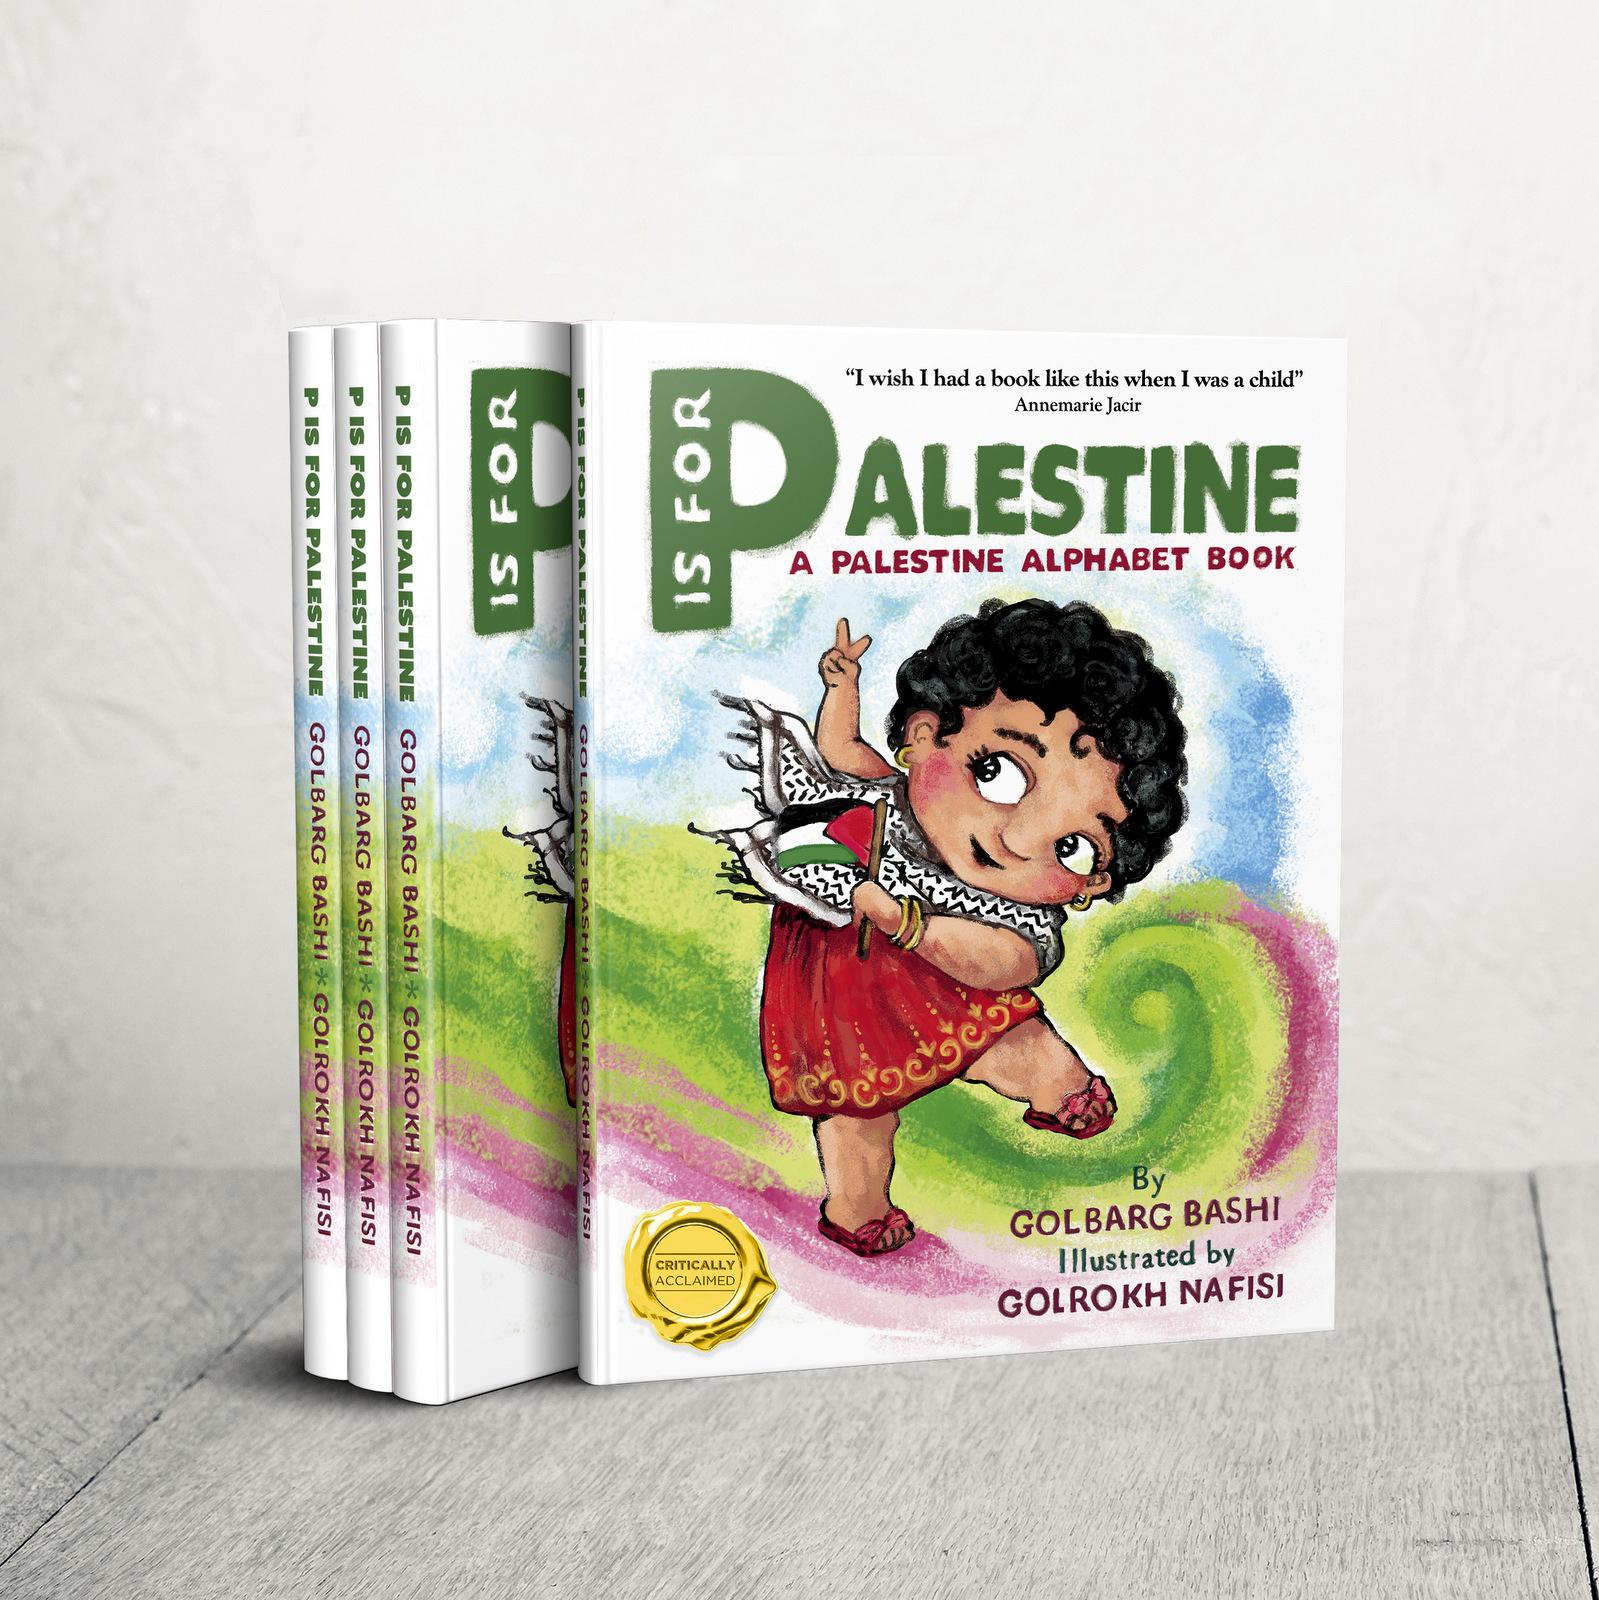 The team behind this book are Middle Eastern-Swedish storyteller Golbarg Bashi aka Dr. Bashi and Golrokh Nafisi, a globally acclaimed illustrator. (drbashi.com)